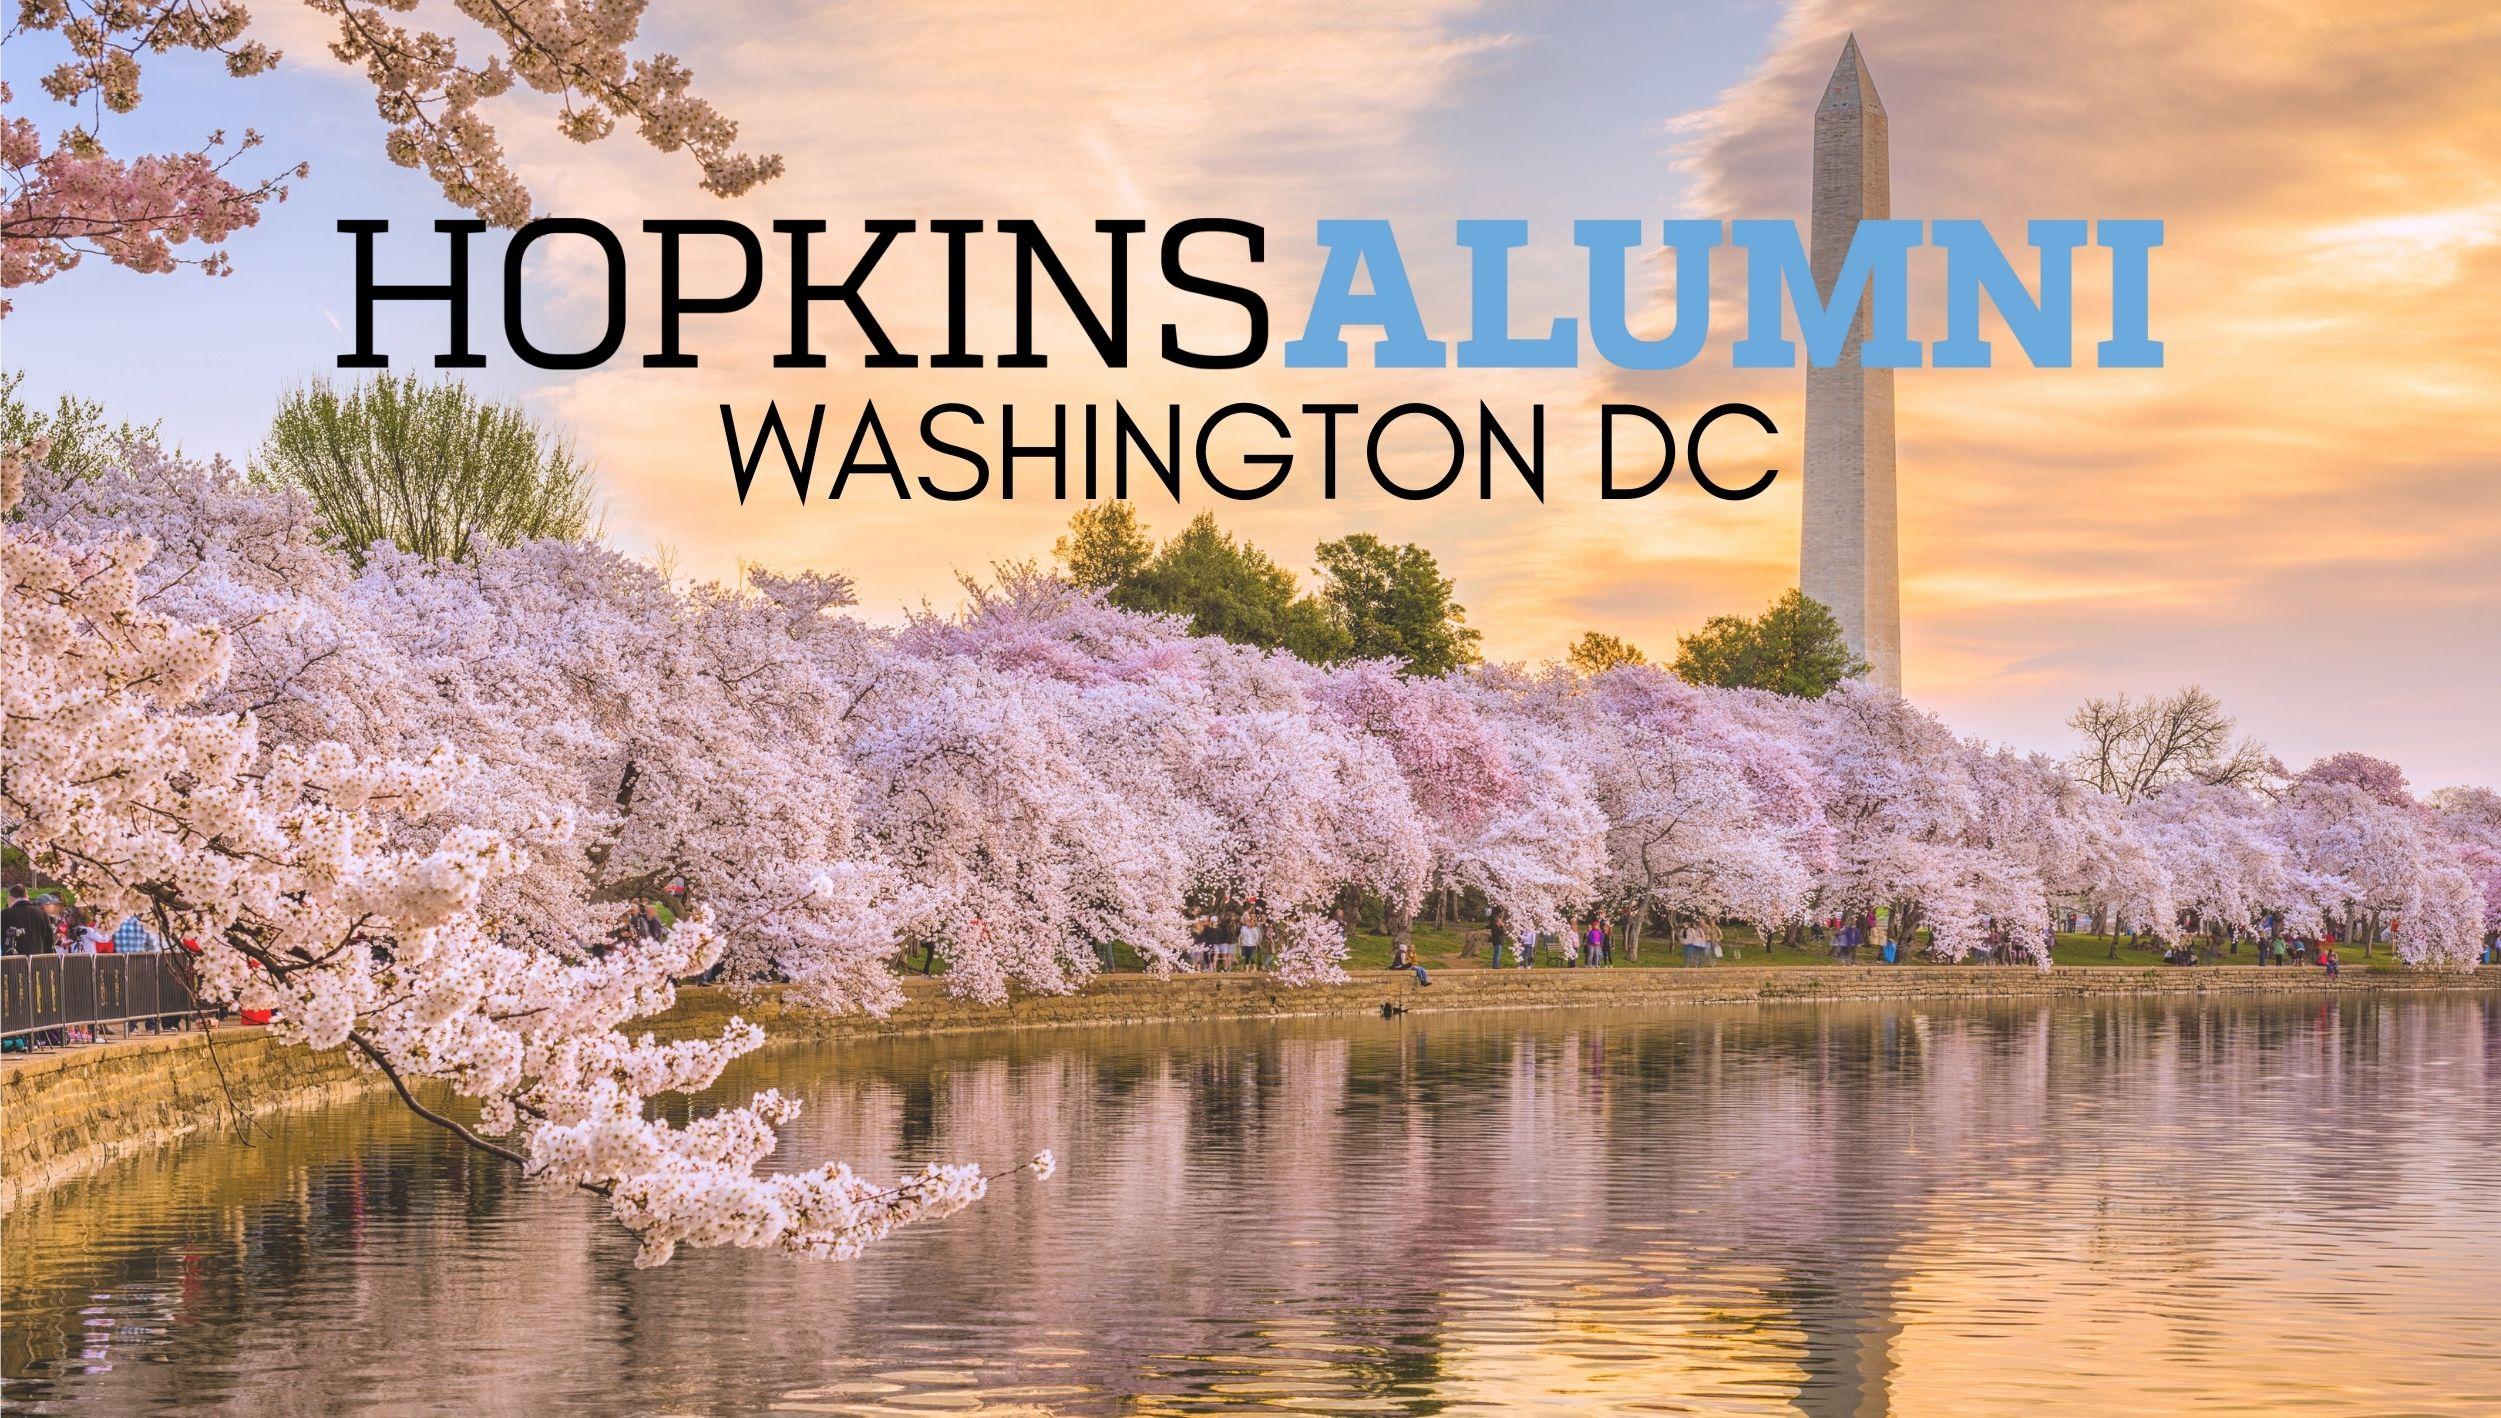 Washington DC Skyline with Hopkins Alumni Washington DC In-Person